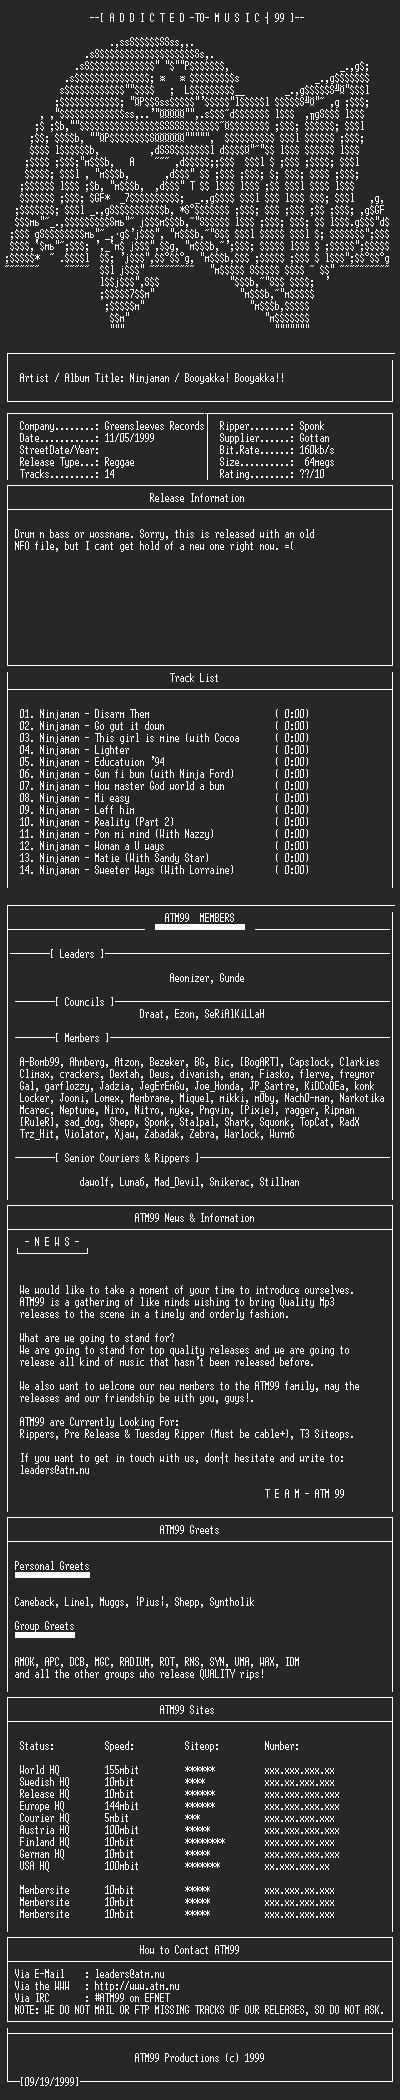 NFO file for Ninjaman_-_Booyakka!_Booyakka!!_(1994)_-_ATM99